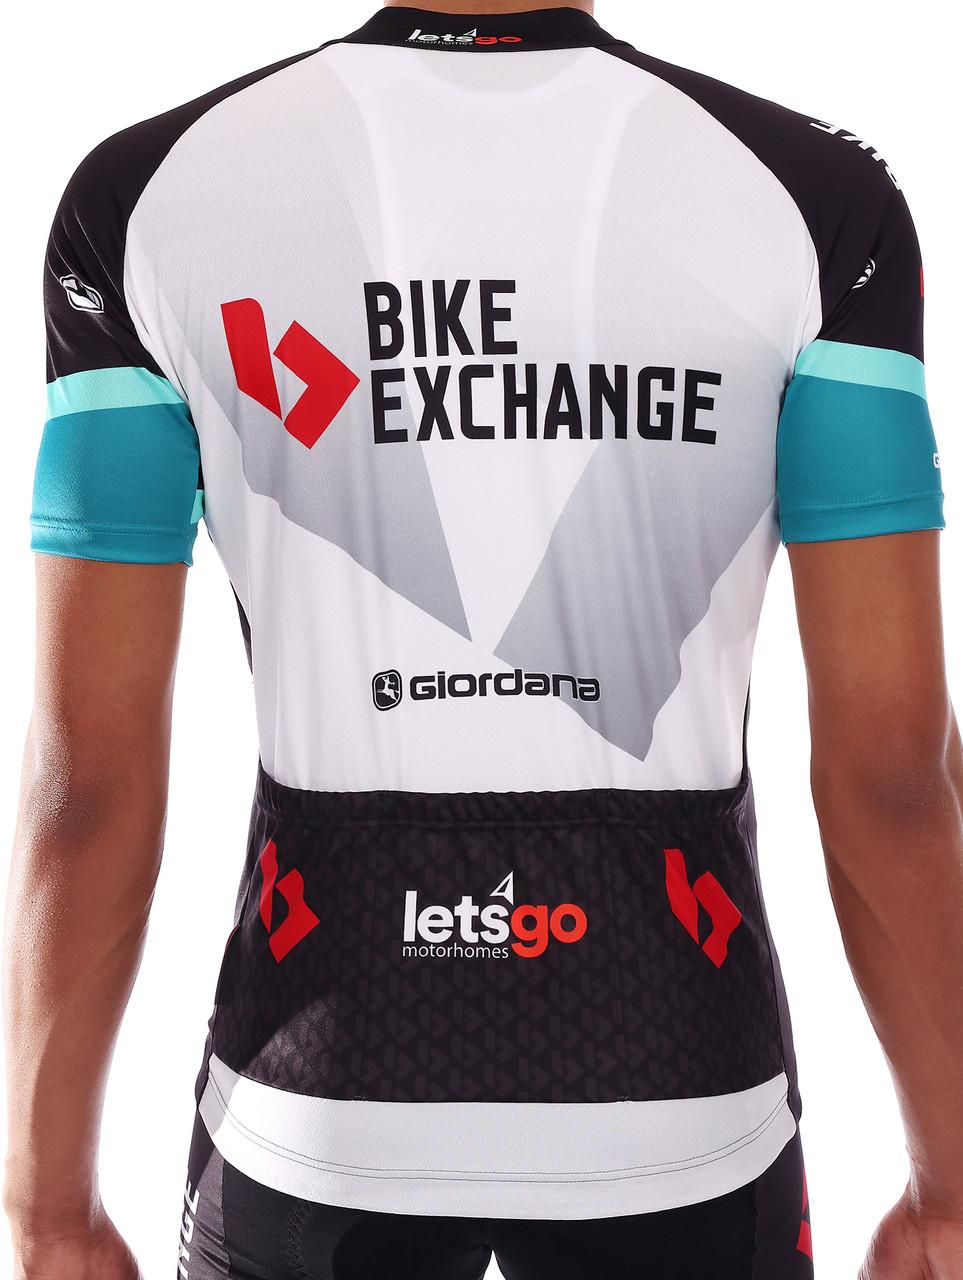 2021 BikeExchange Vero Pro FZ Jersey  Rear